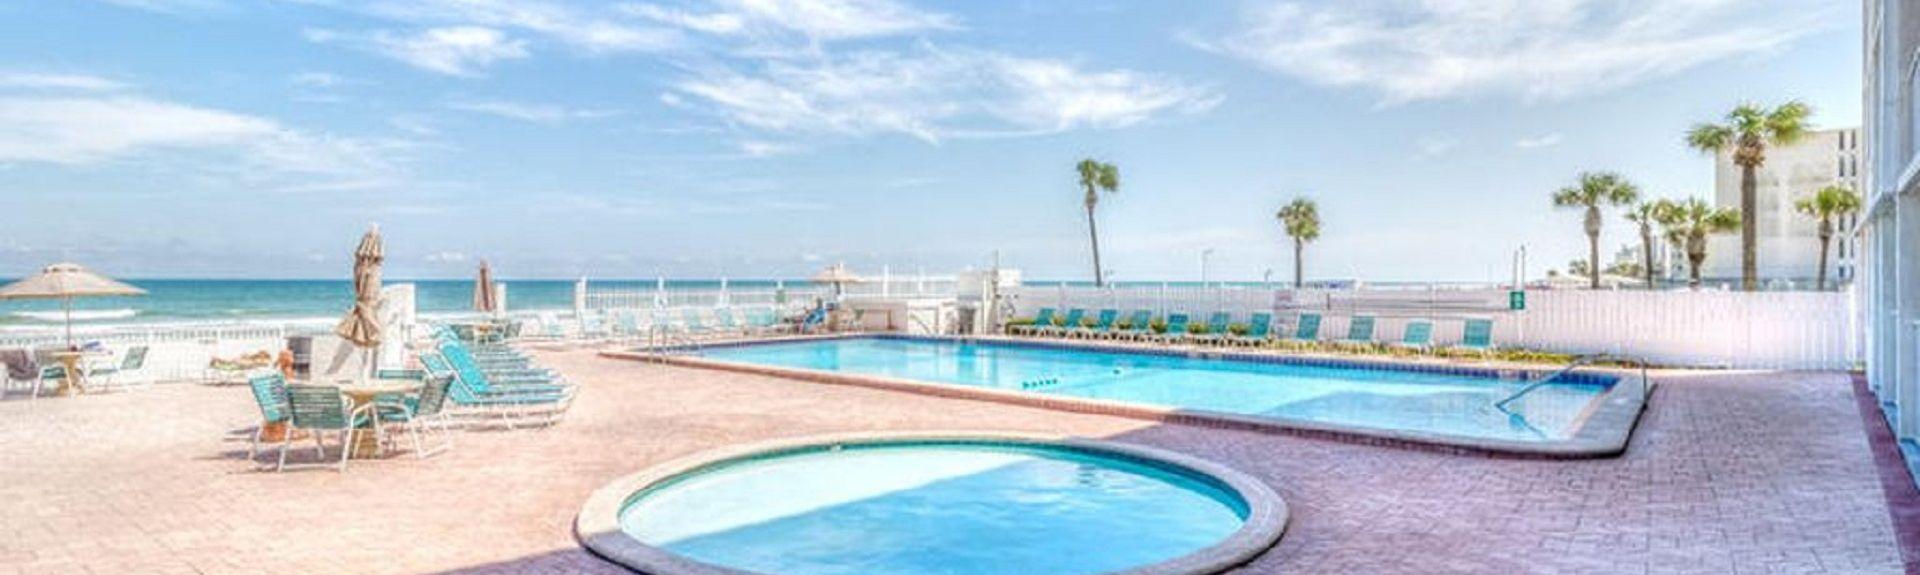 Pato Manor, Daytona Beach, FL, USA